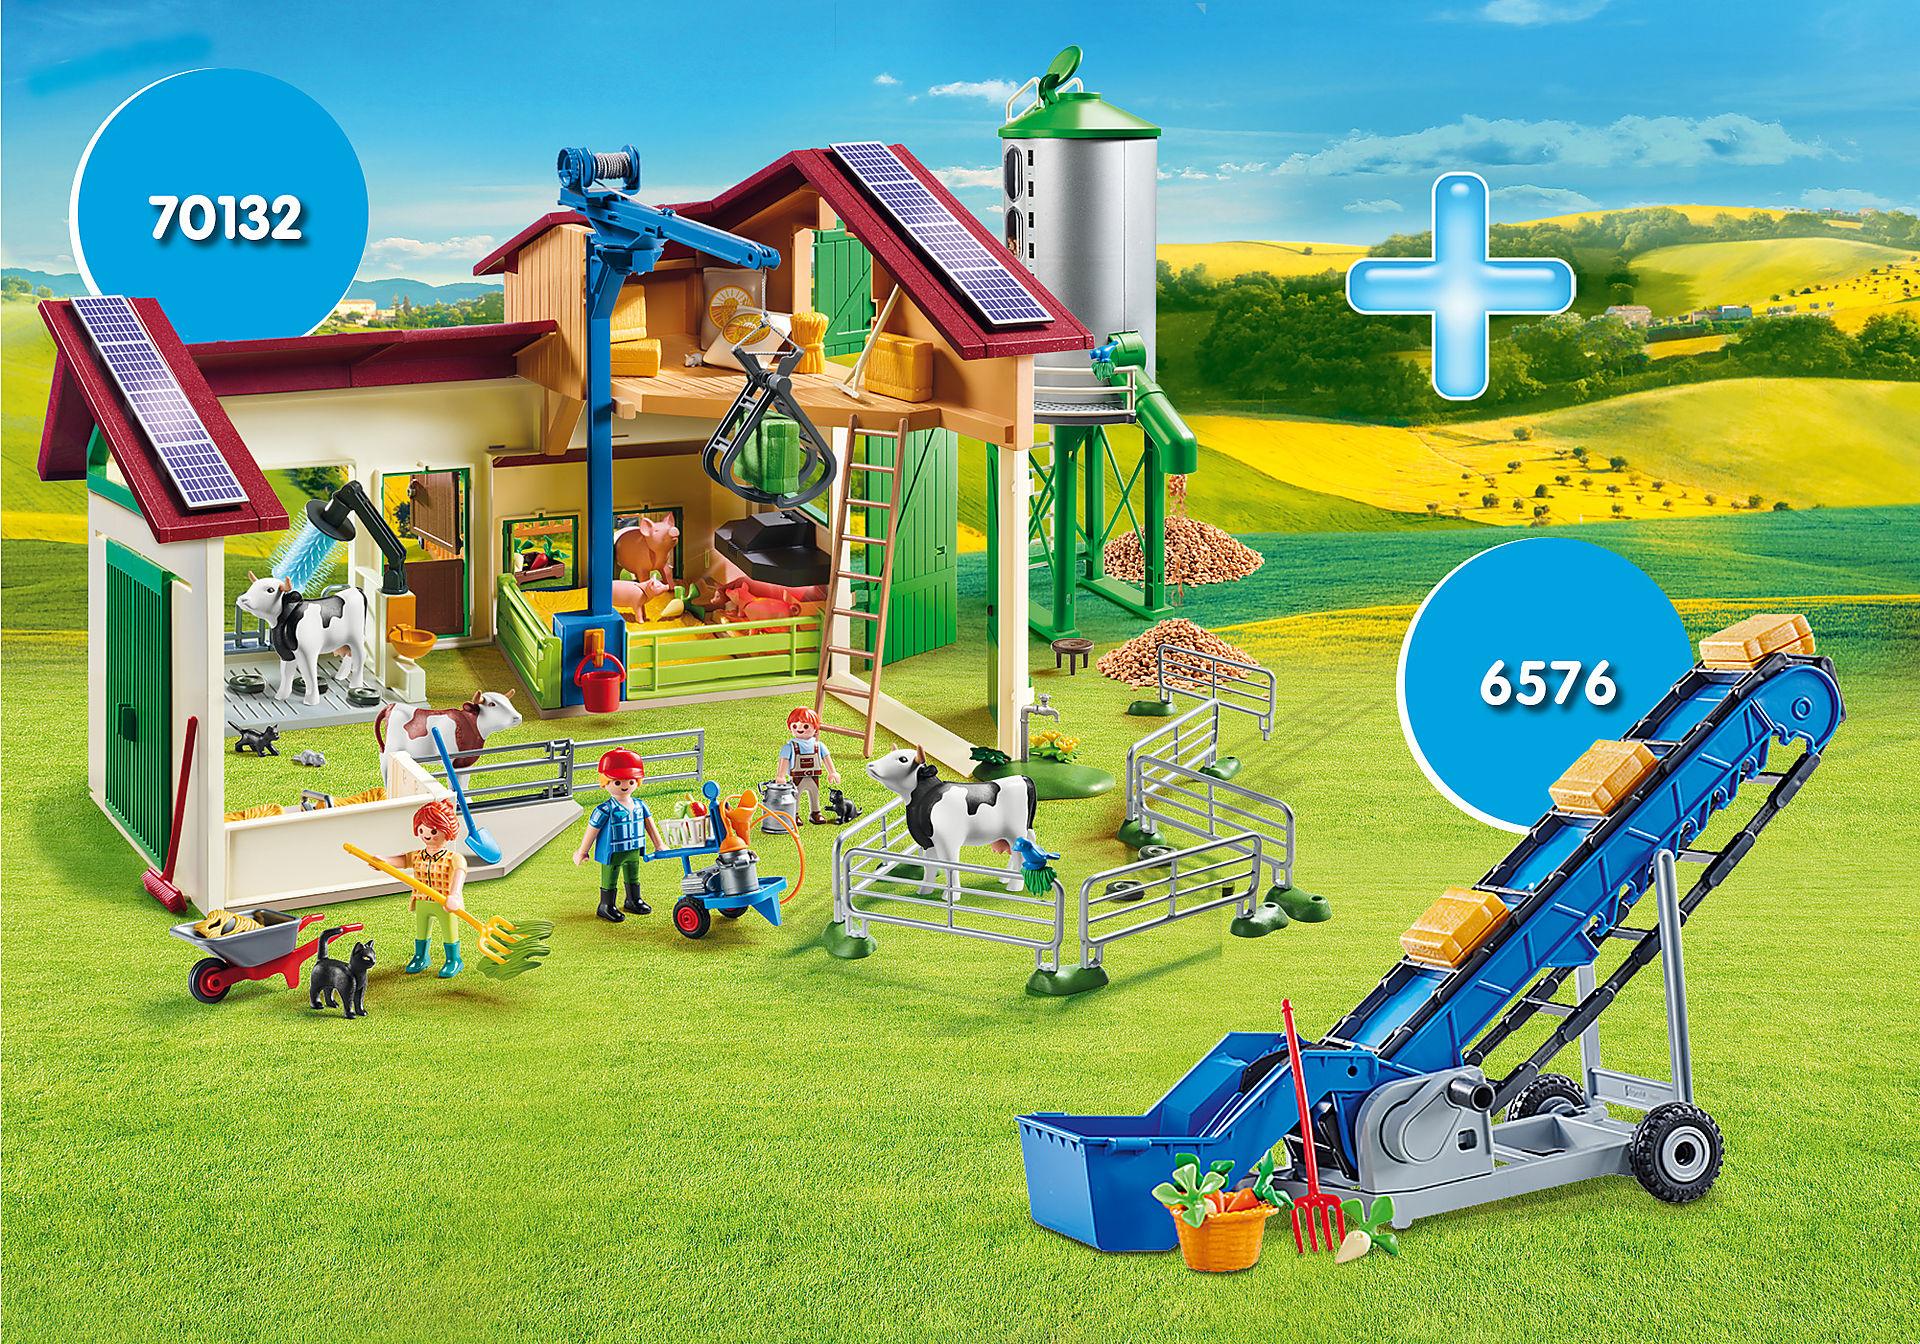 http://media.playmobil.com/i/playmobil/PM1905J_product_detail/Bundle Bauernhof